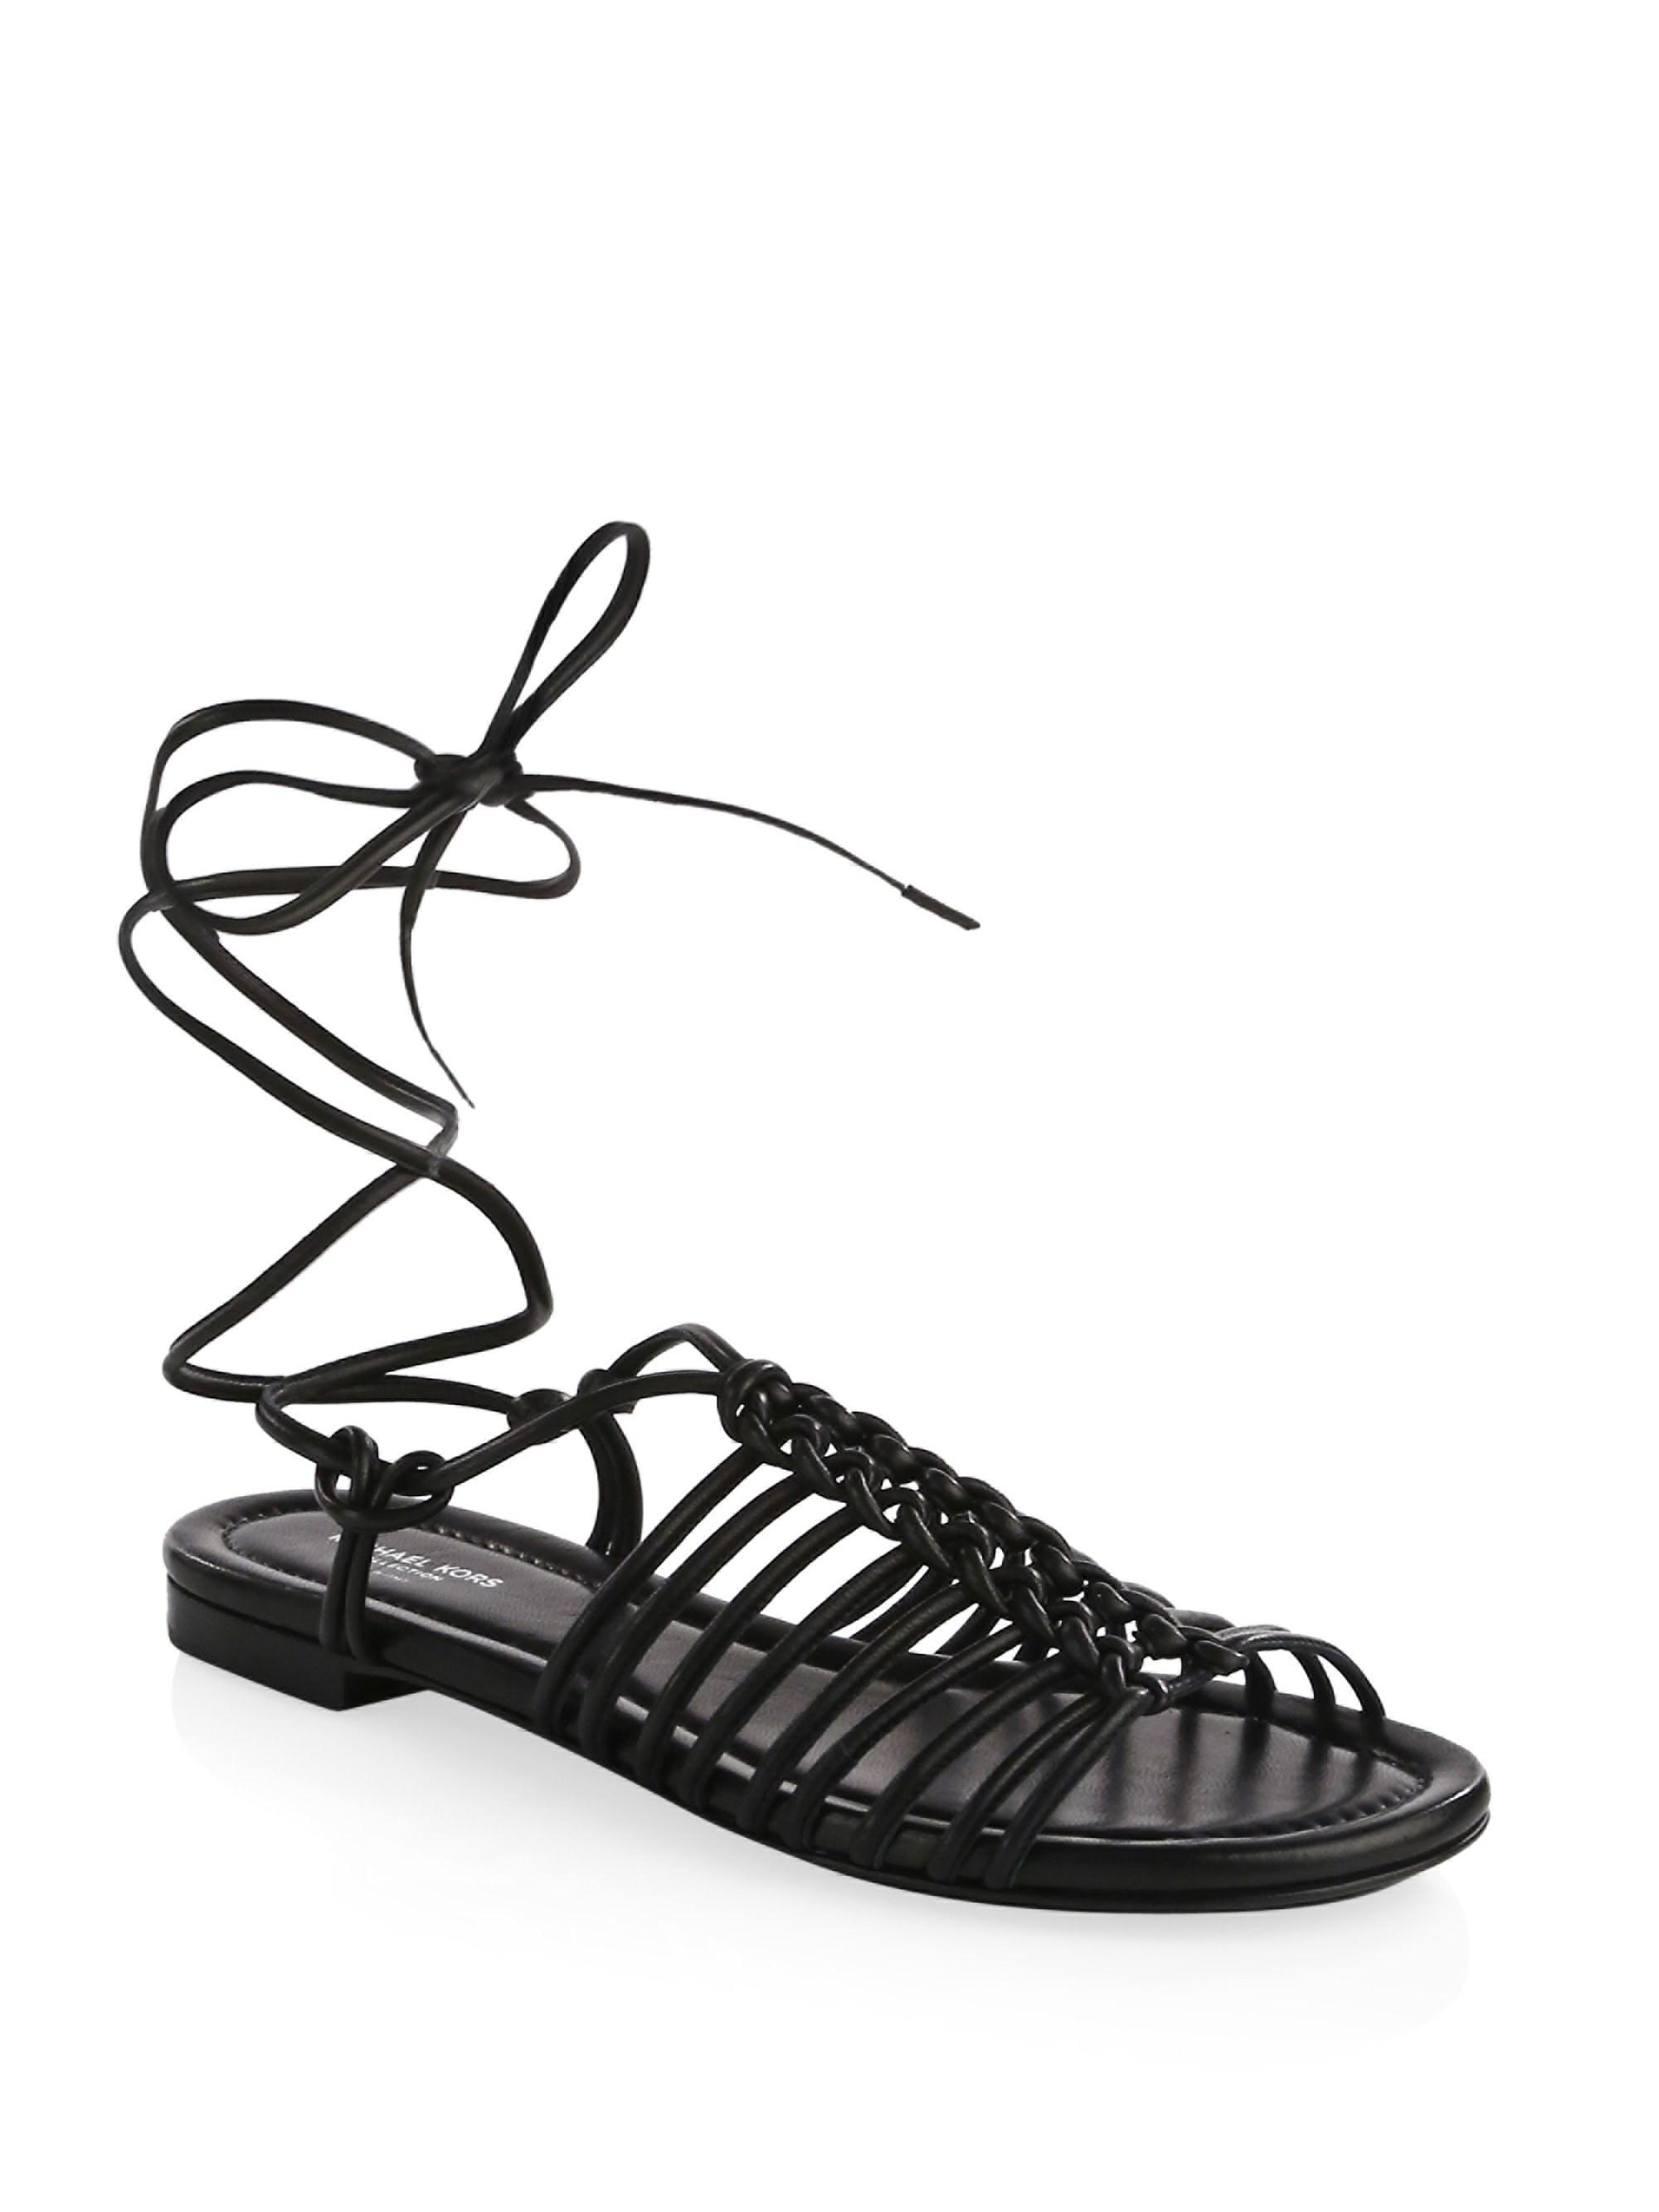 d869f04d99b Lyst - Michael Kors Women s Fagan Braided Sandals - Black - Size 37 ...